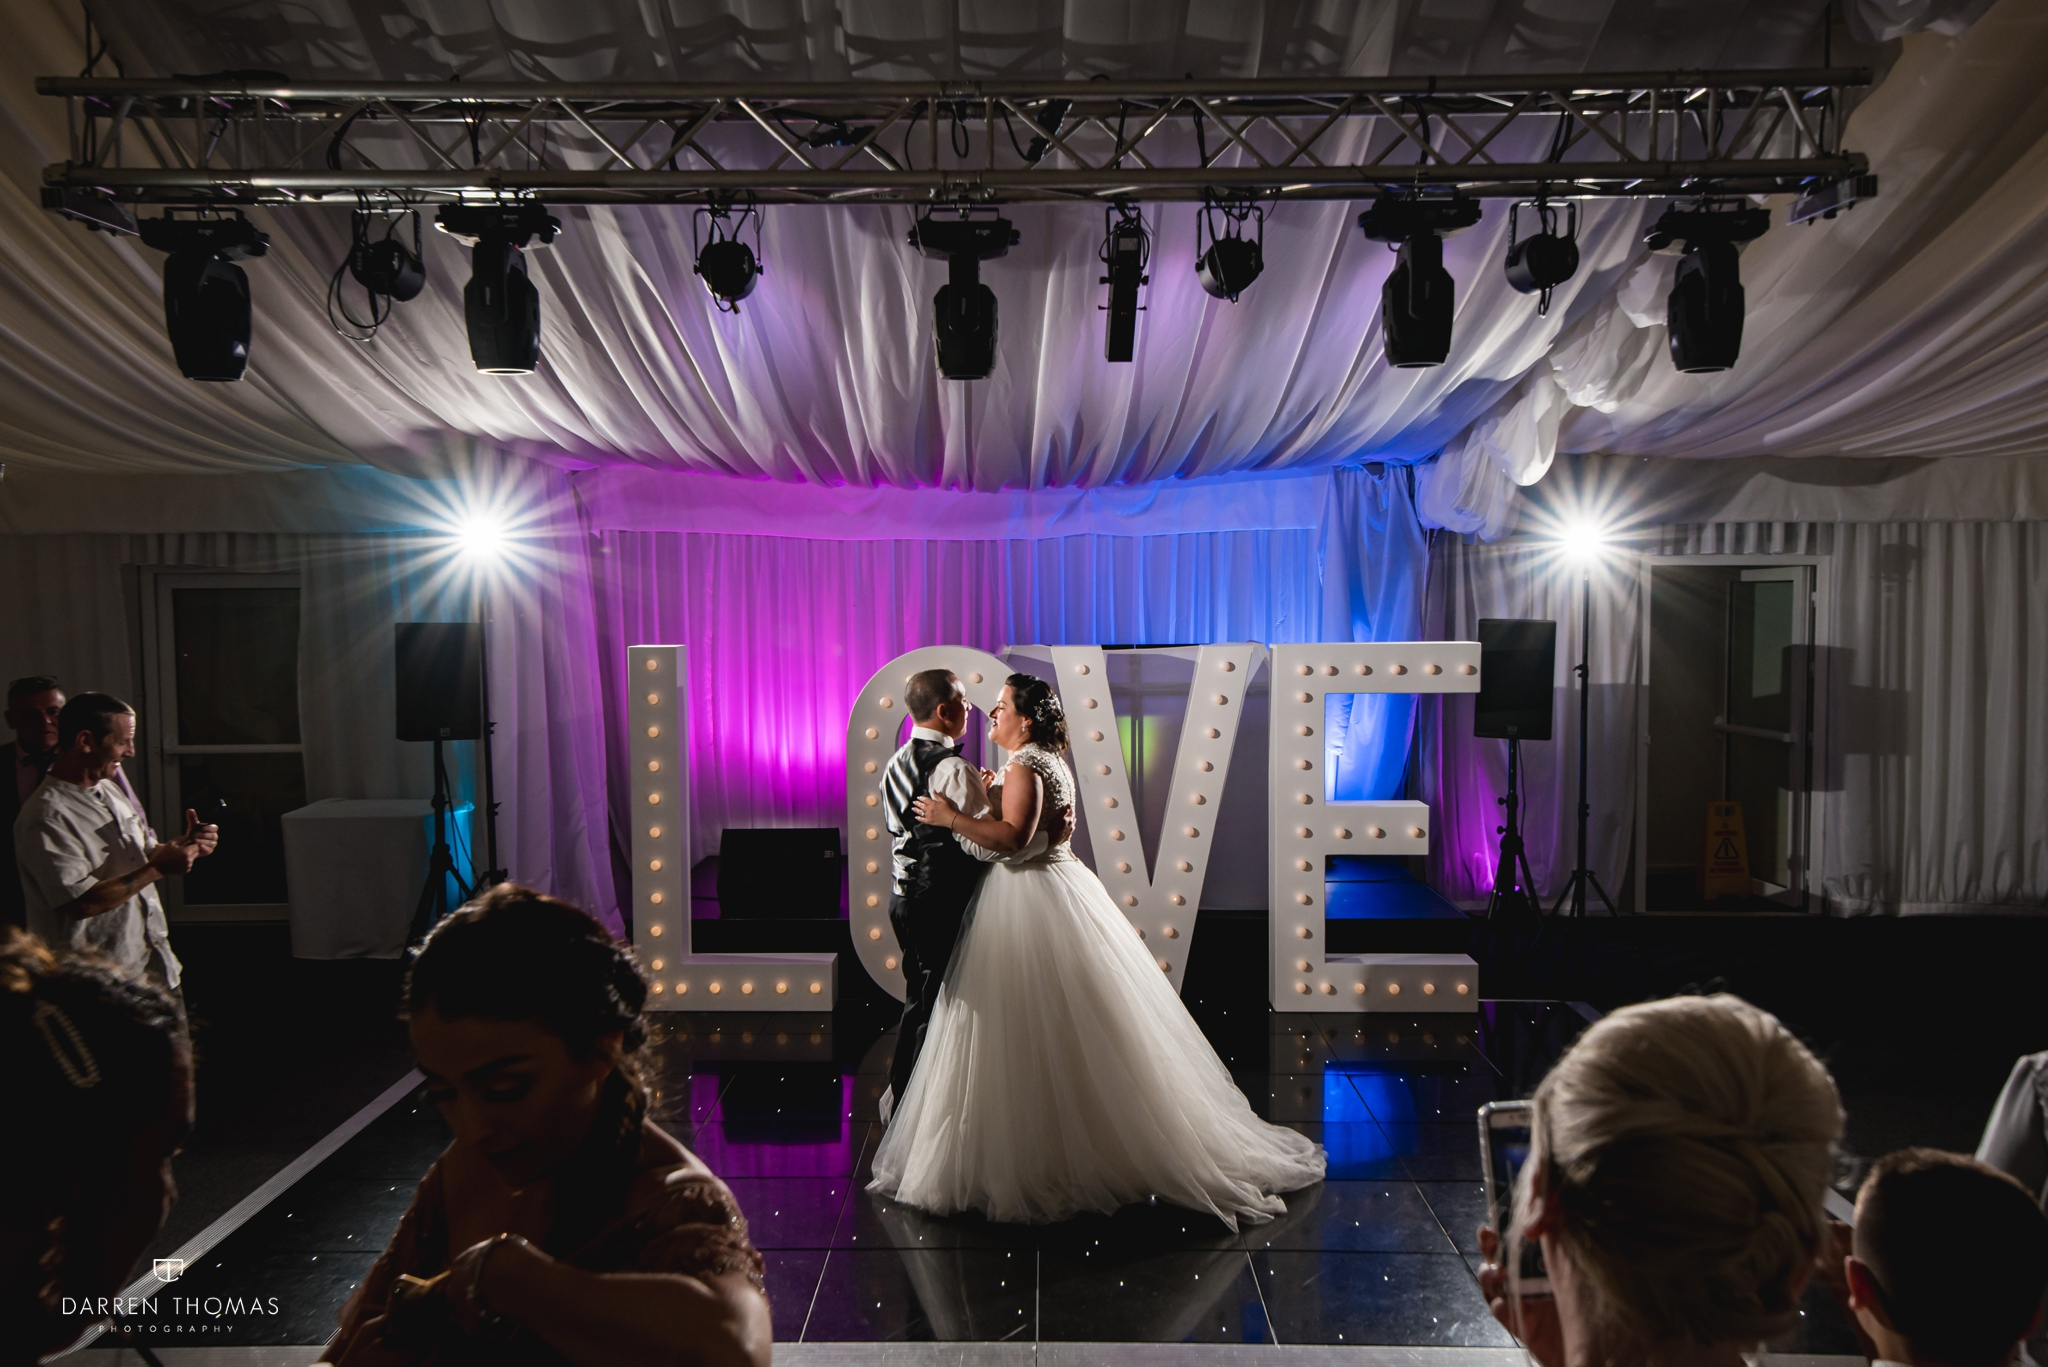 Llechwen-hall-wedding-photography20.jpg